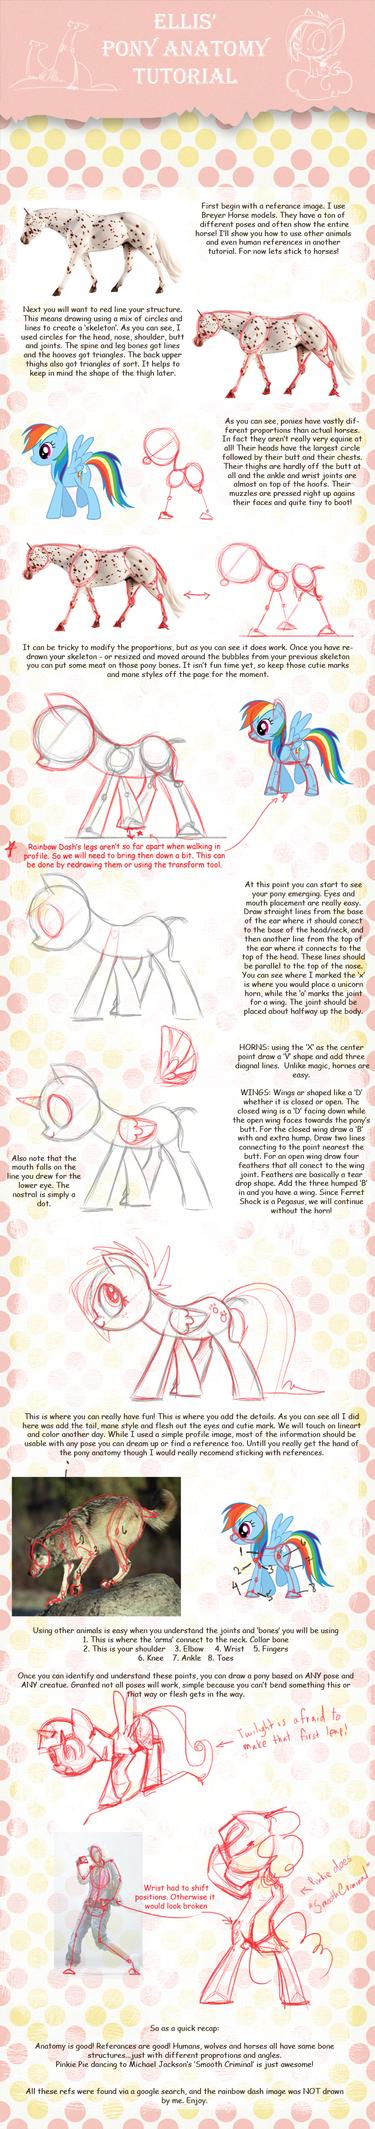 Pony Anatomy Tutorial by EllisArts